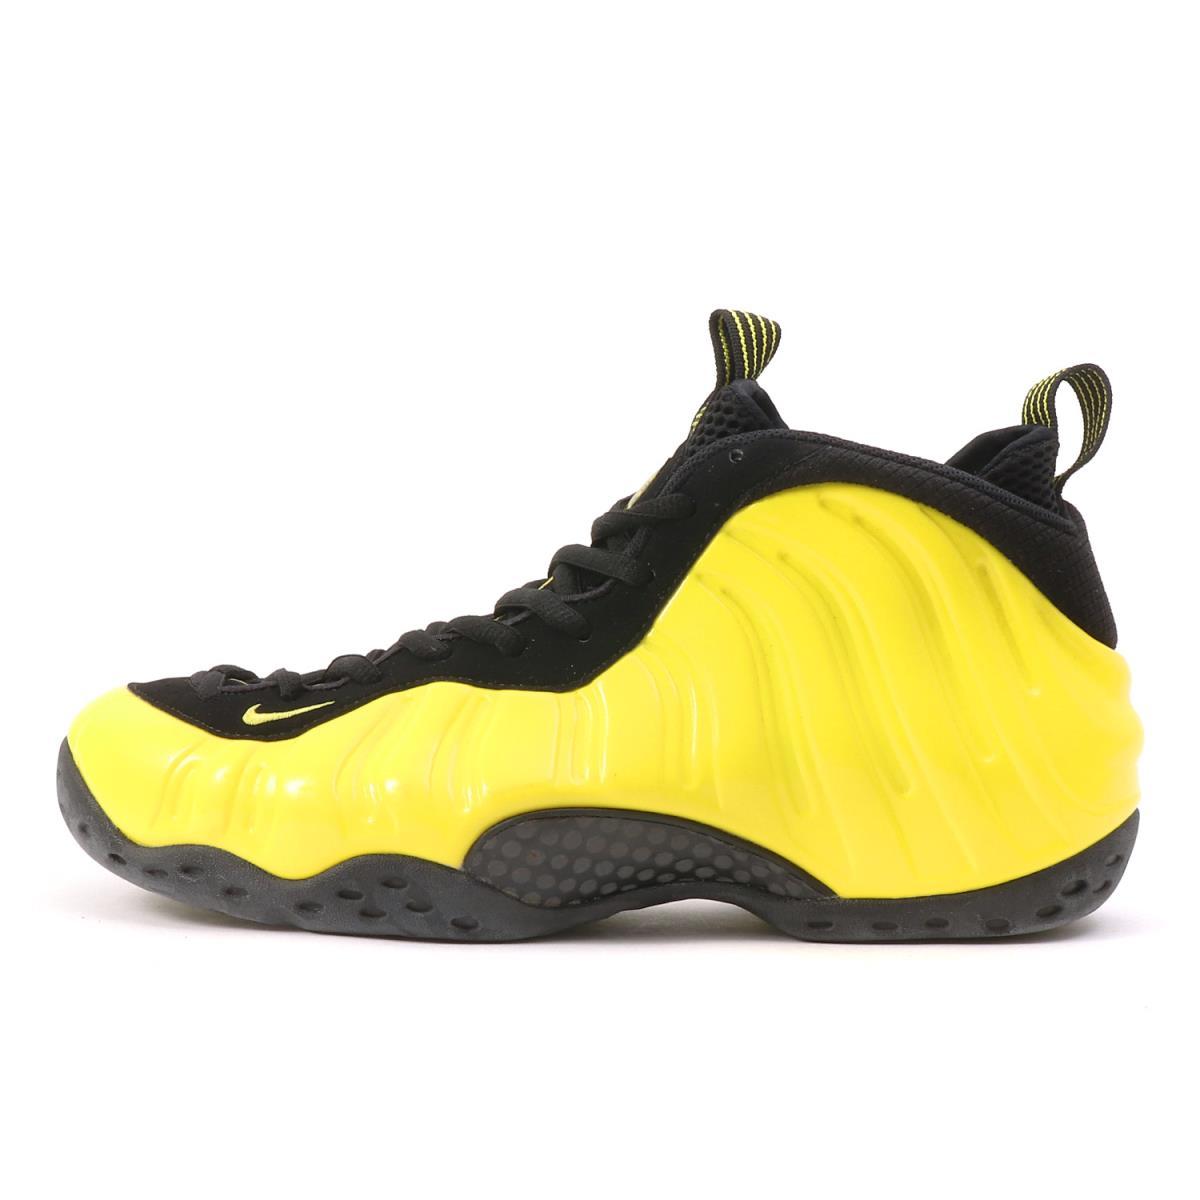 buy online 97327 4553a NIKE (Nike) AIR FOAMPOSITE ONE OPTIC YELLOW (314,996-701) Opti stake  Herault X black US10(28cm)